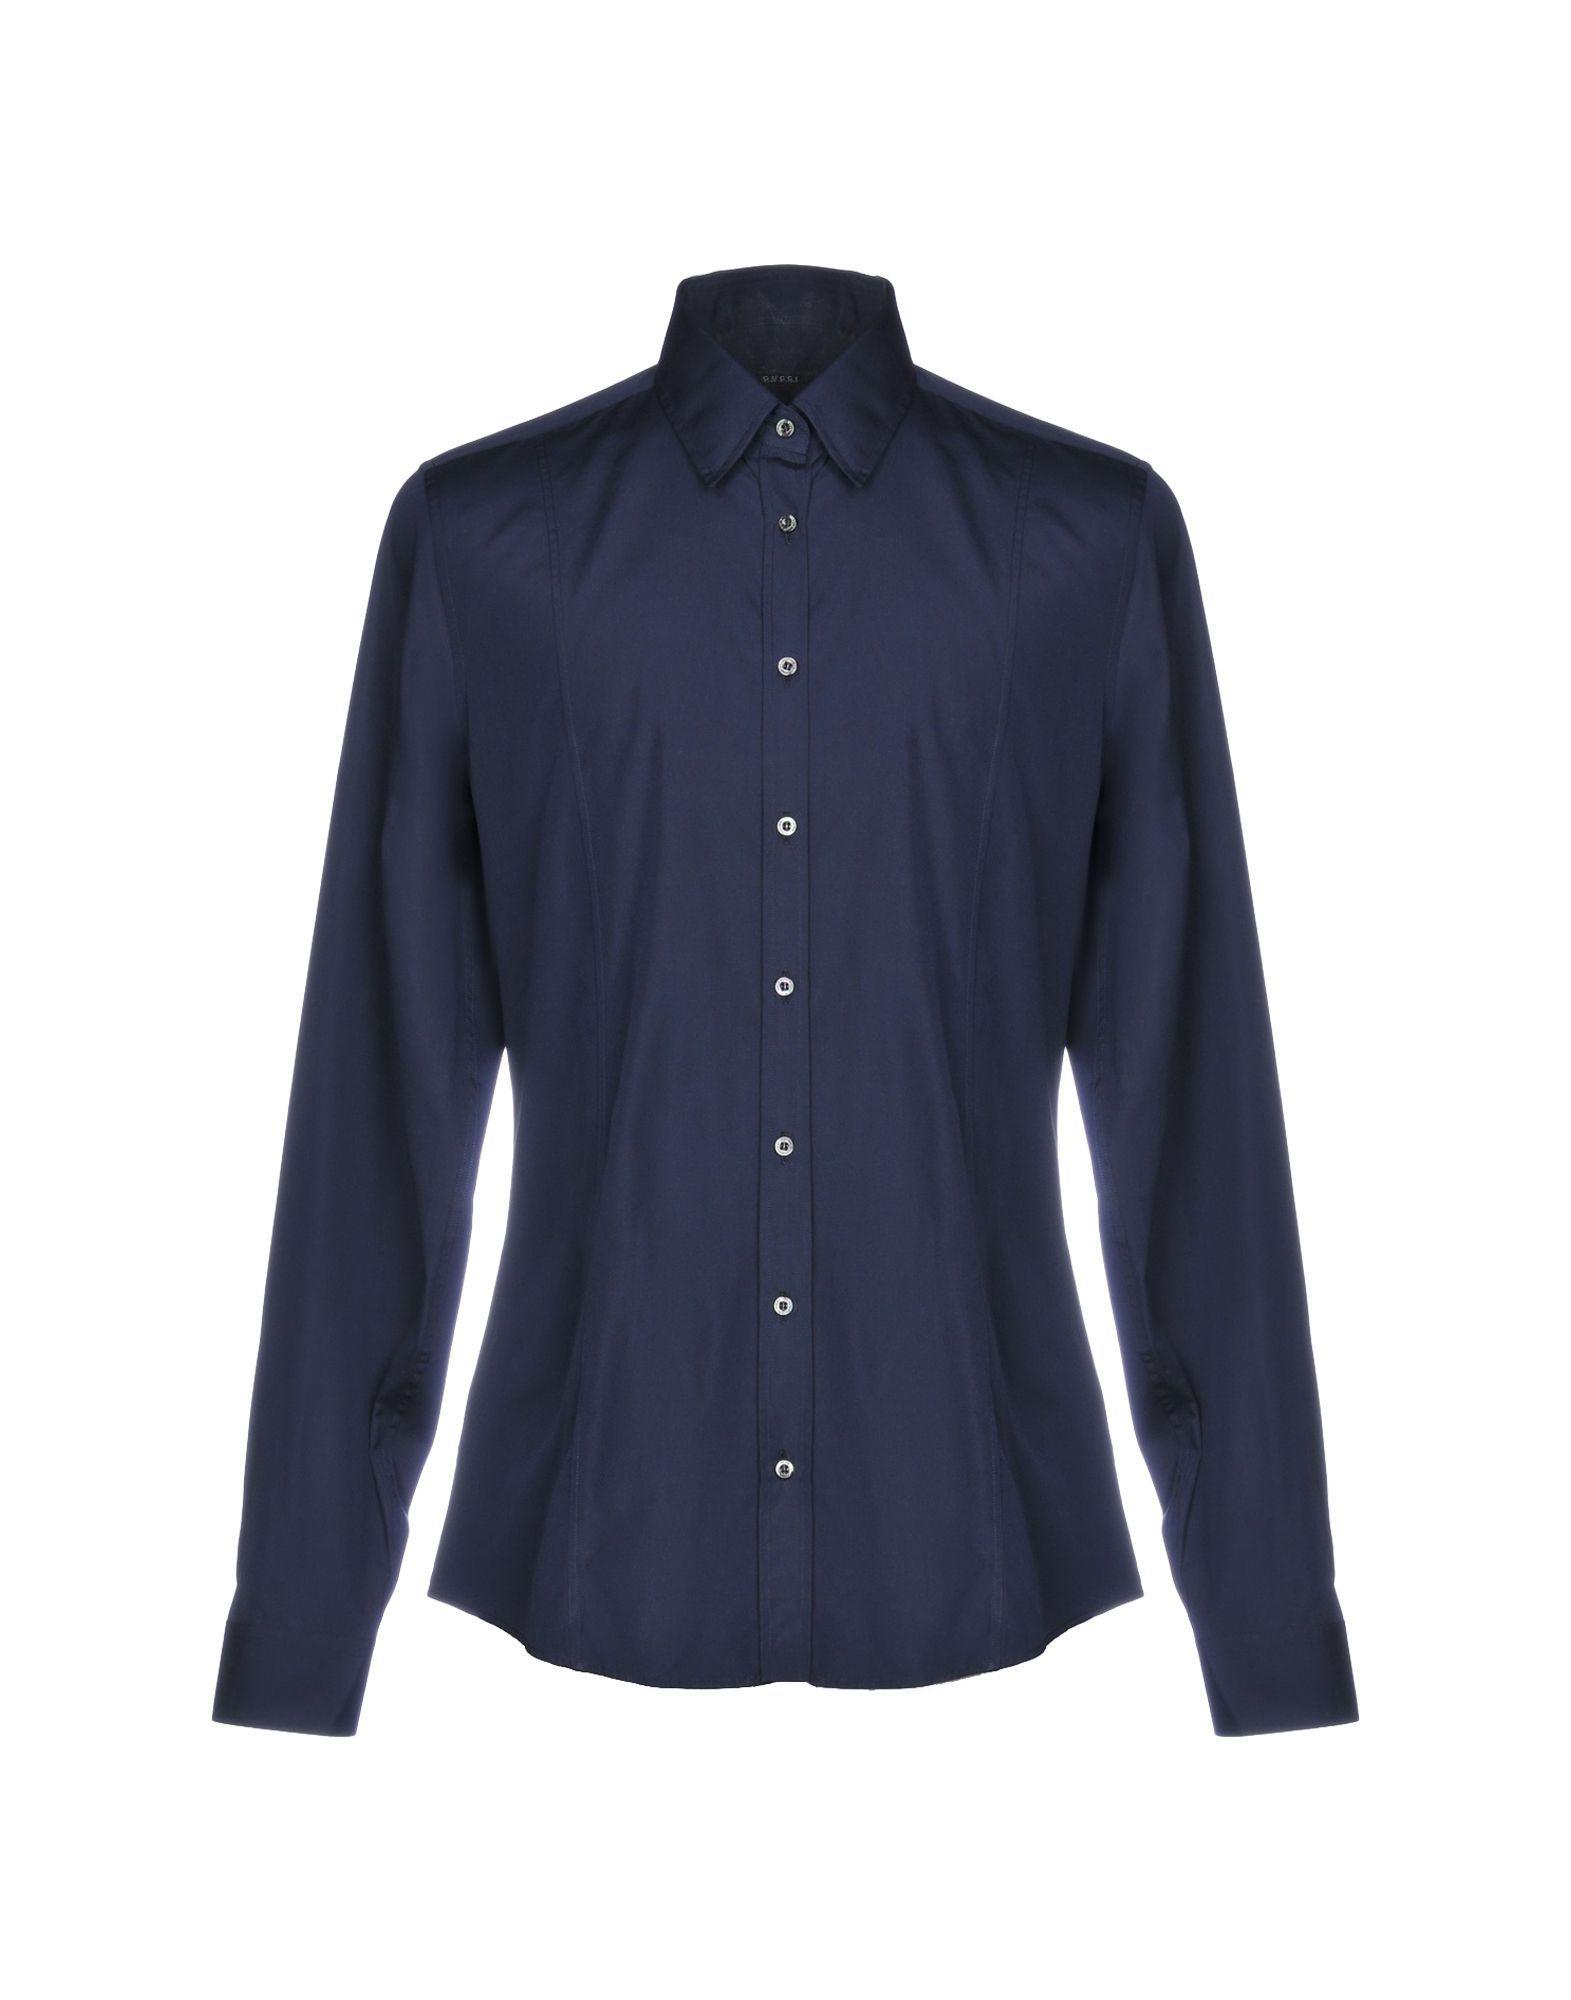 7098b5db31f8 Gucci Shirt in Blue for Men - Lyst